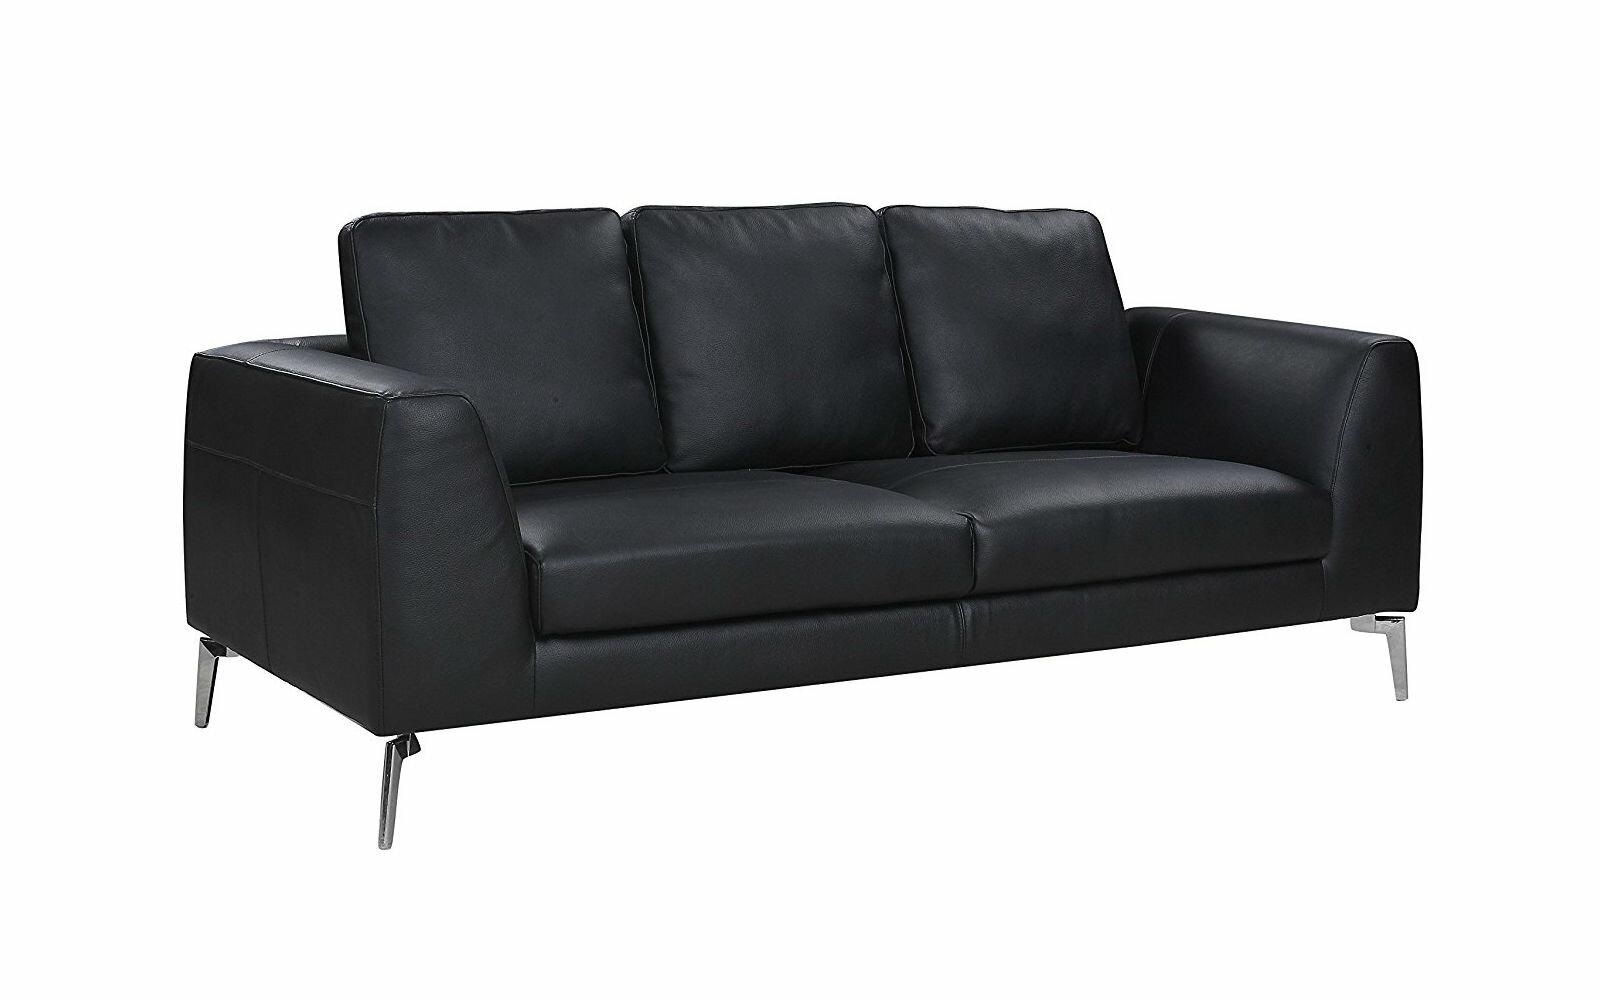 Wrayon Mid Century Modern Plush Top Grain Leather Sofa